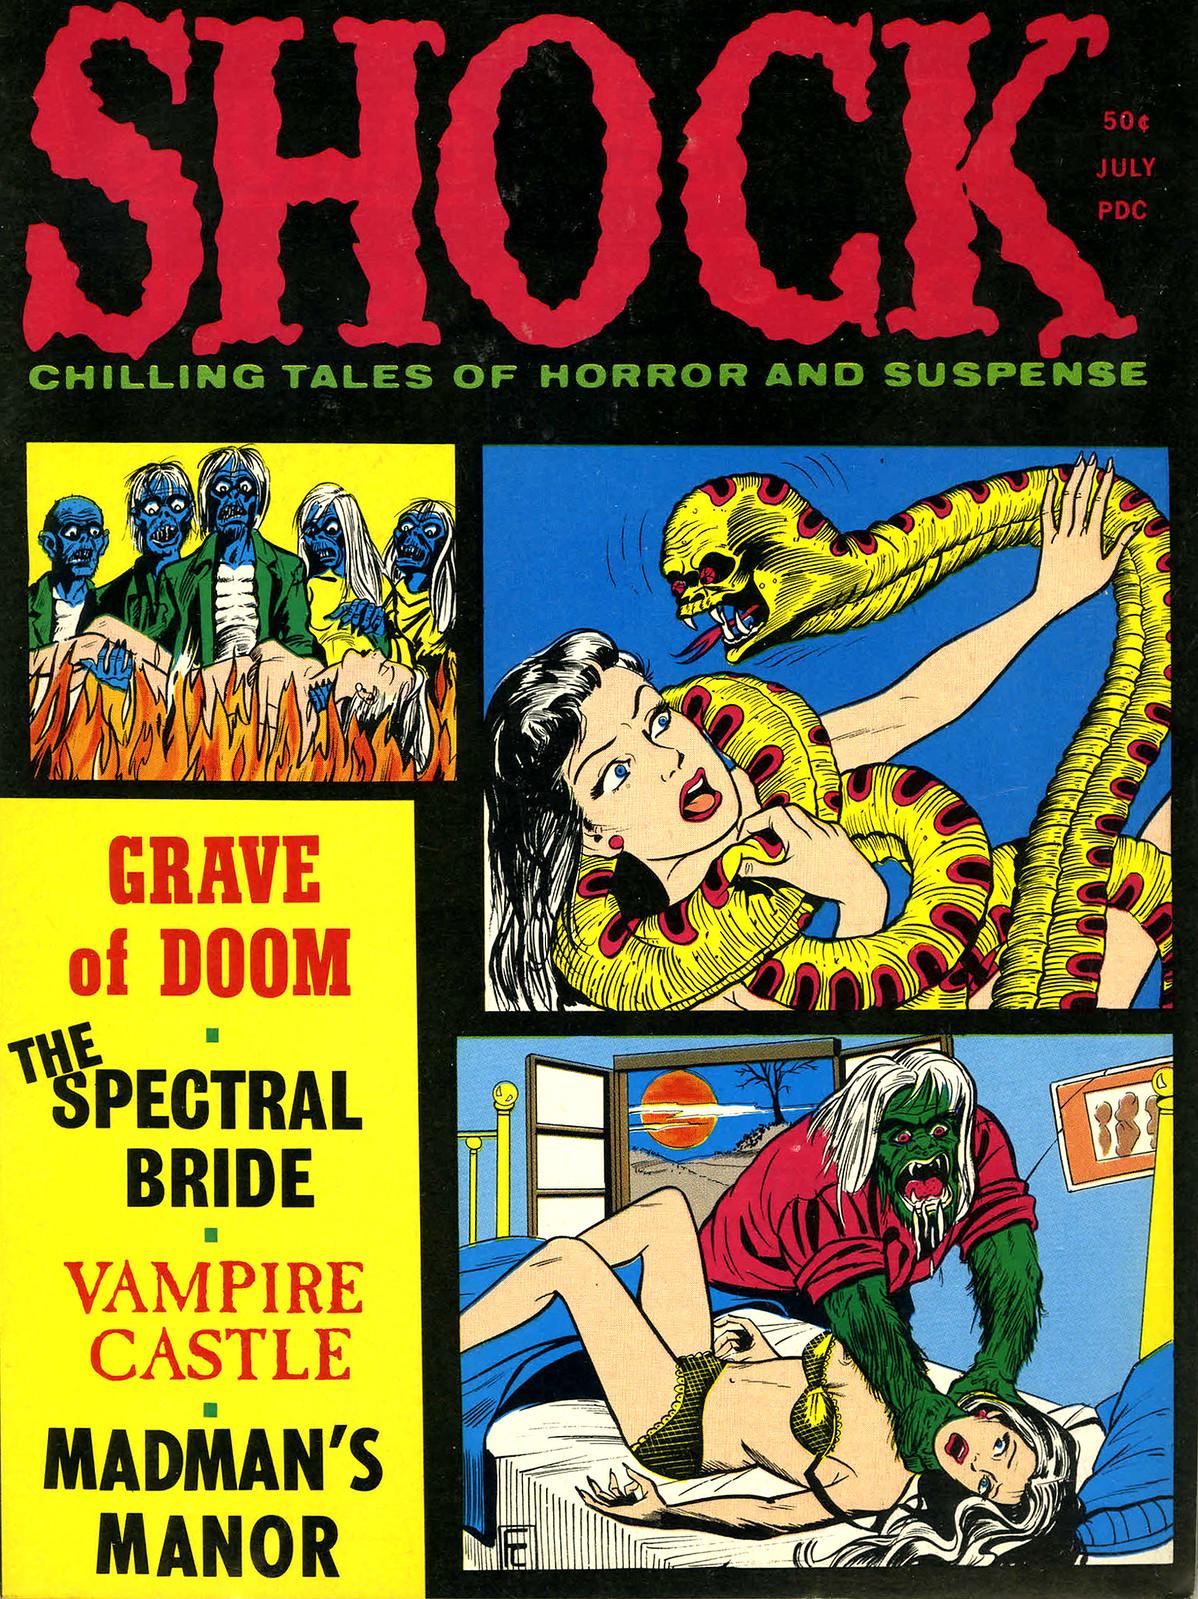 Shock - Volume 3, Issue 03, July 1971